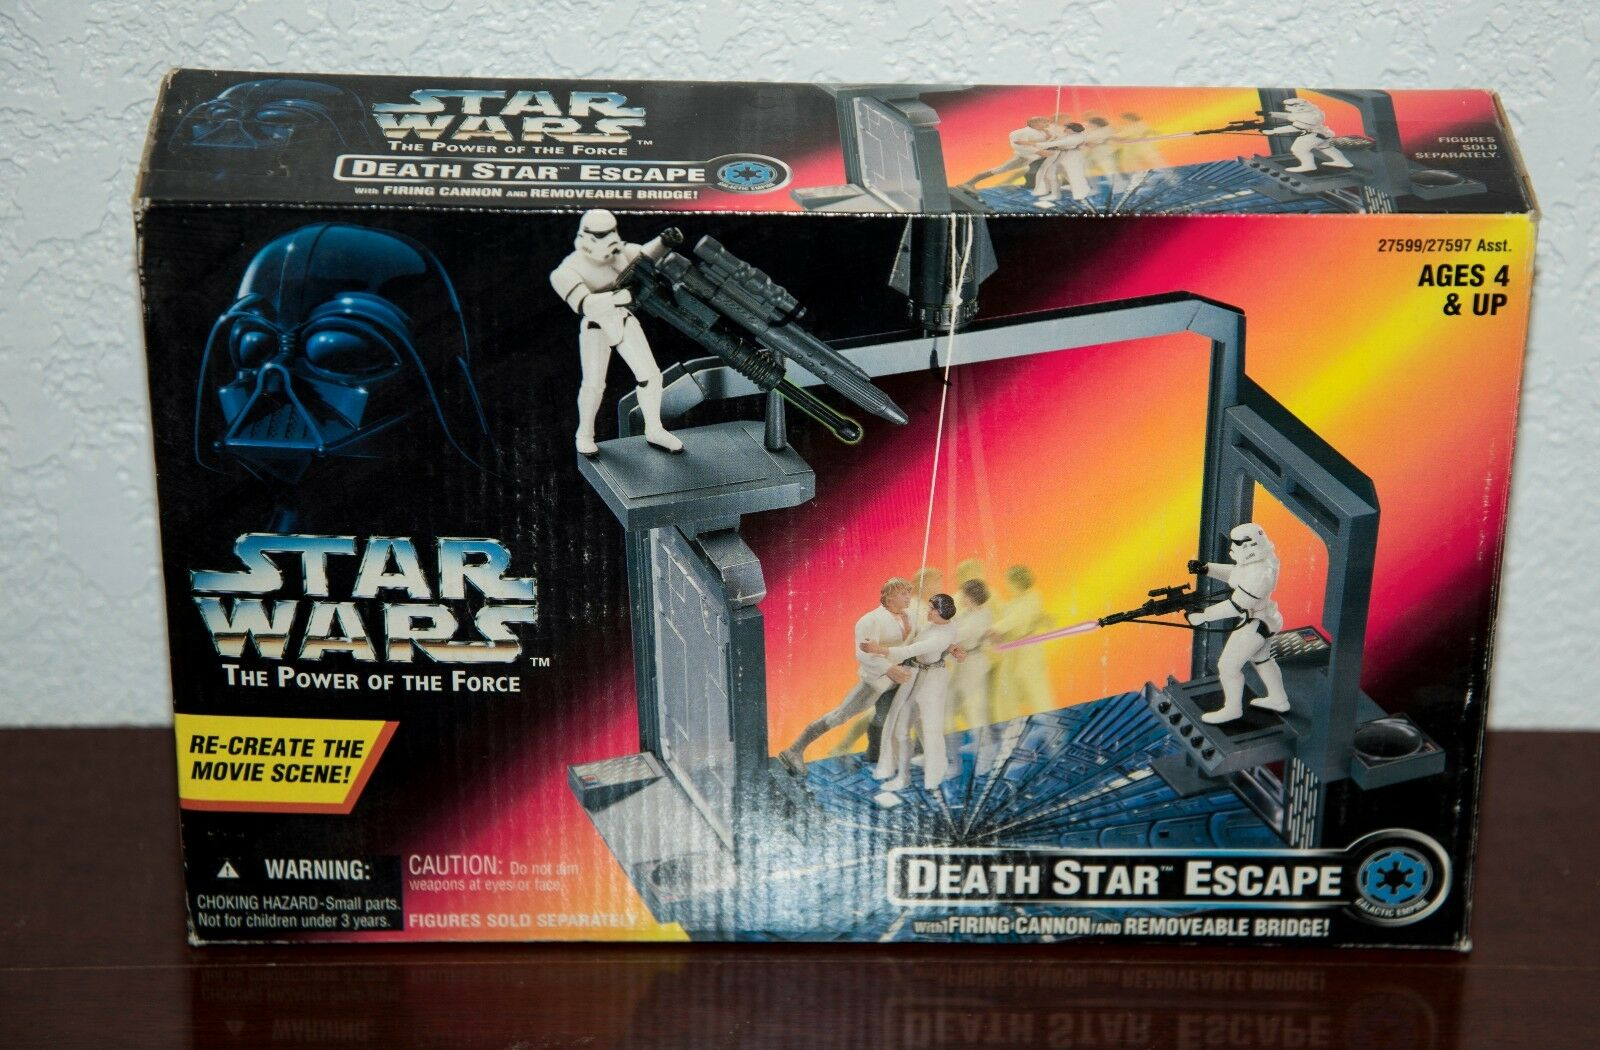 1996 STAR WARS POWER OF THE FORCE DEATH STAR STAR STAR ESCAPE PLAYSET MIB f18a3b